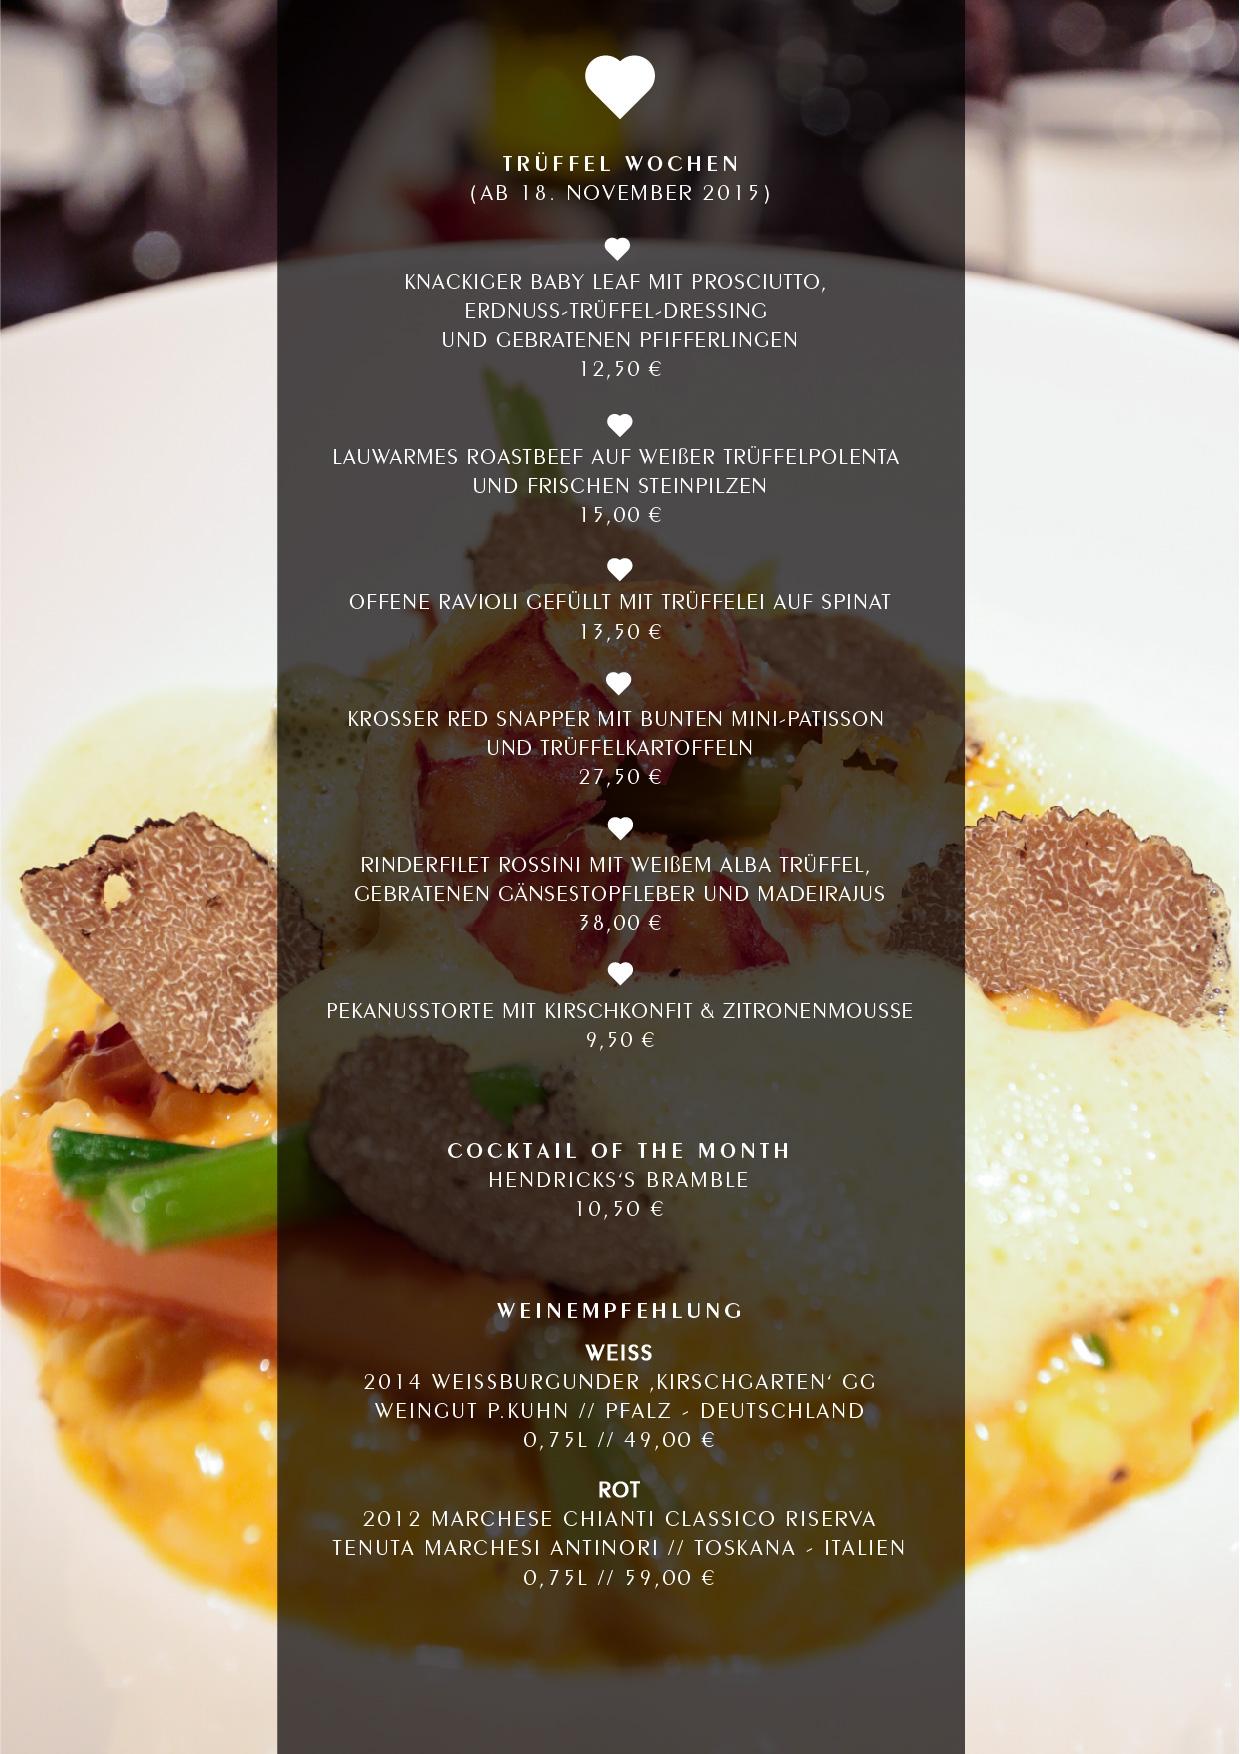 Trüffel Wochen - Heart Restaurant & Bar